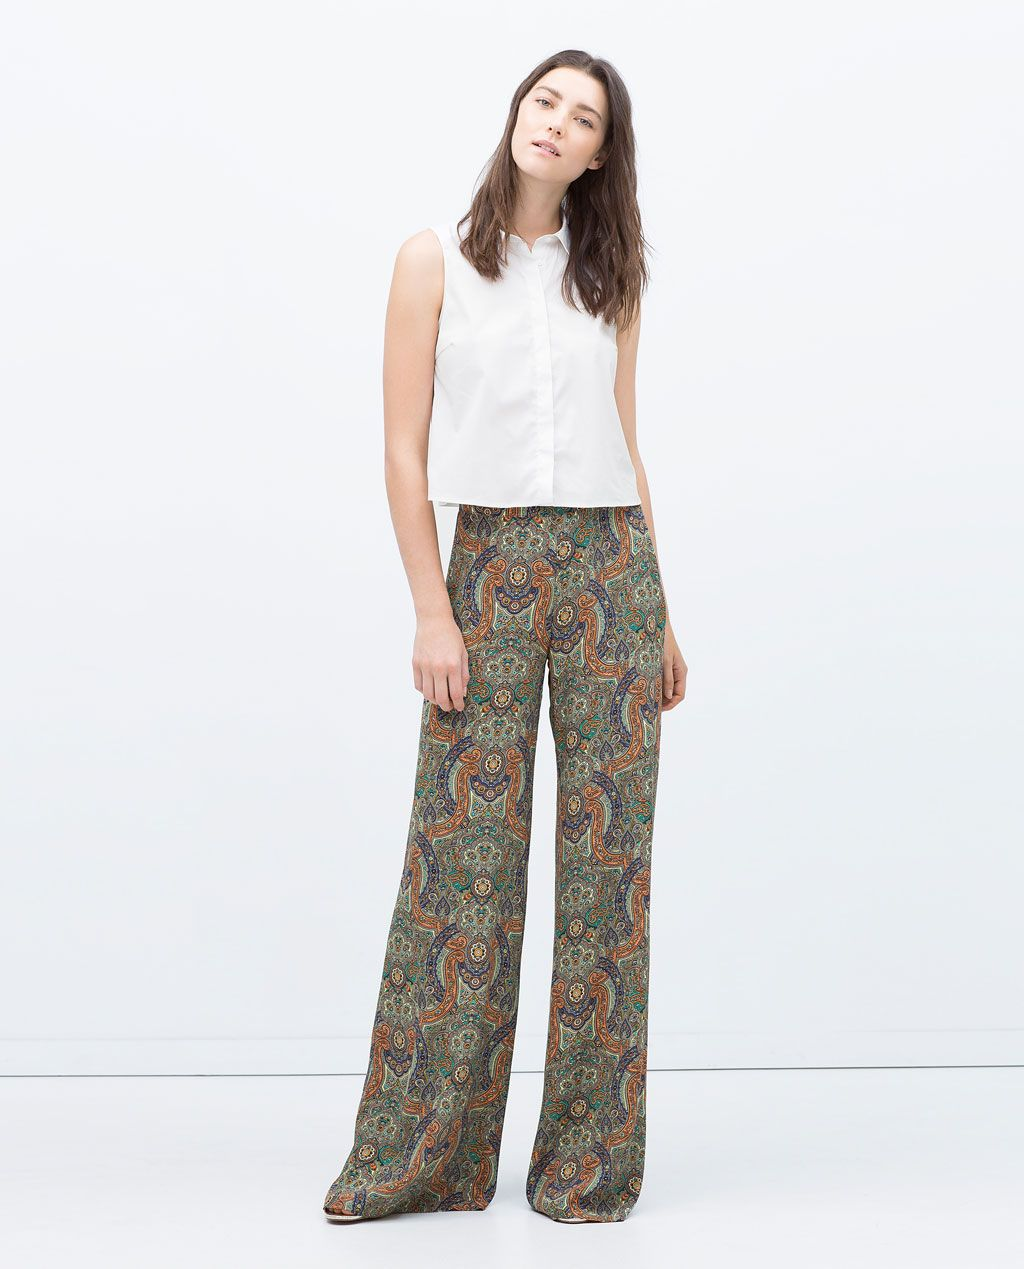 pantalon large imprim femme nouveaut s zara france fringues pinterest pantalons larges. Black Bedroom Furniture Sets. Home Design Ideas